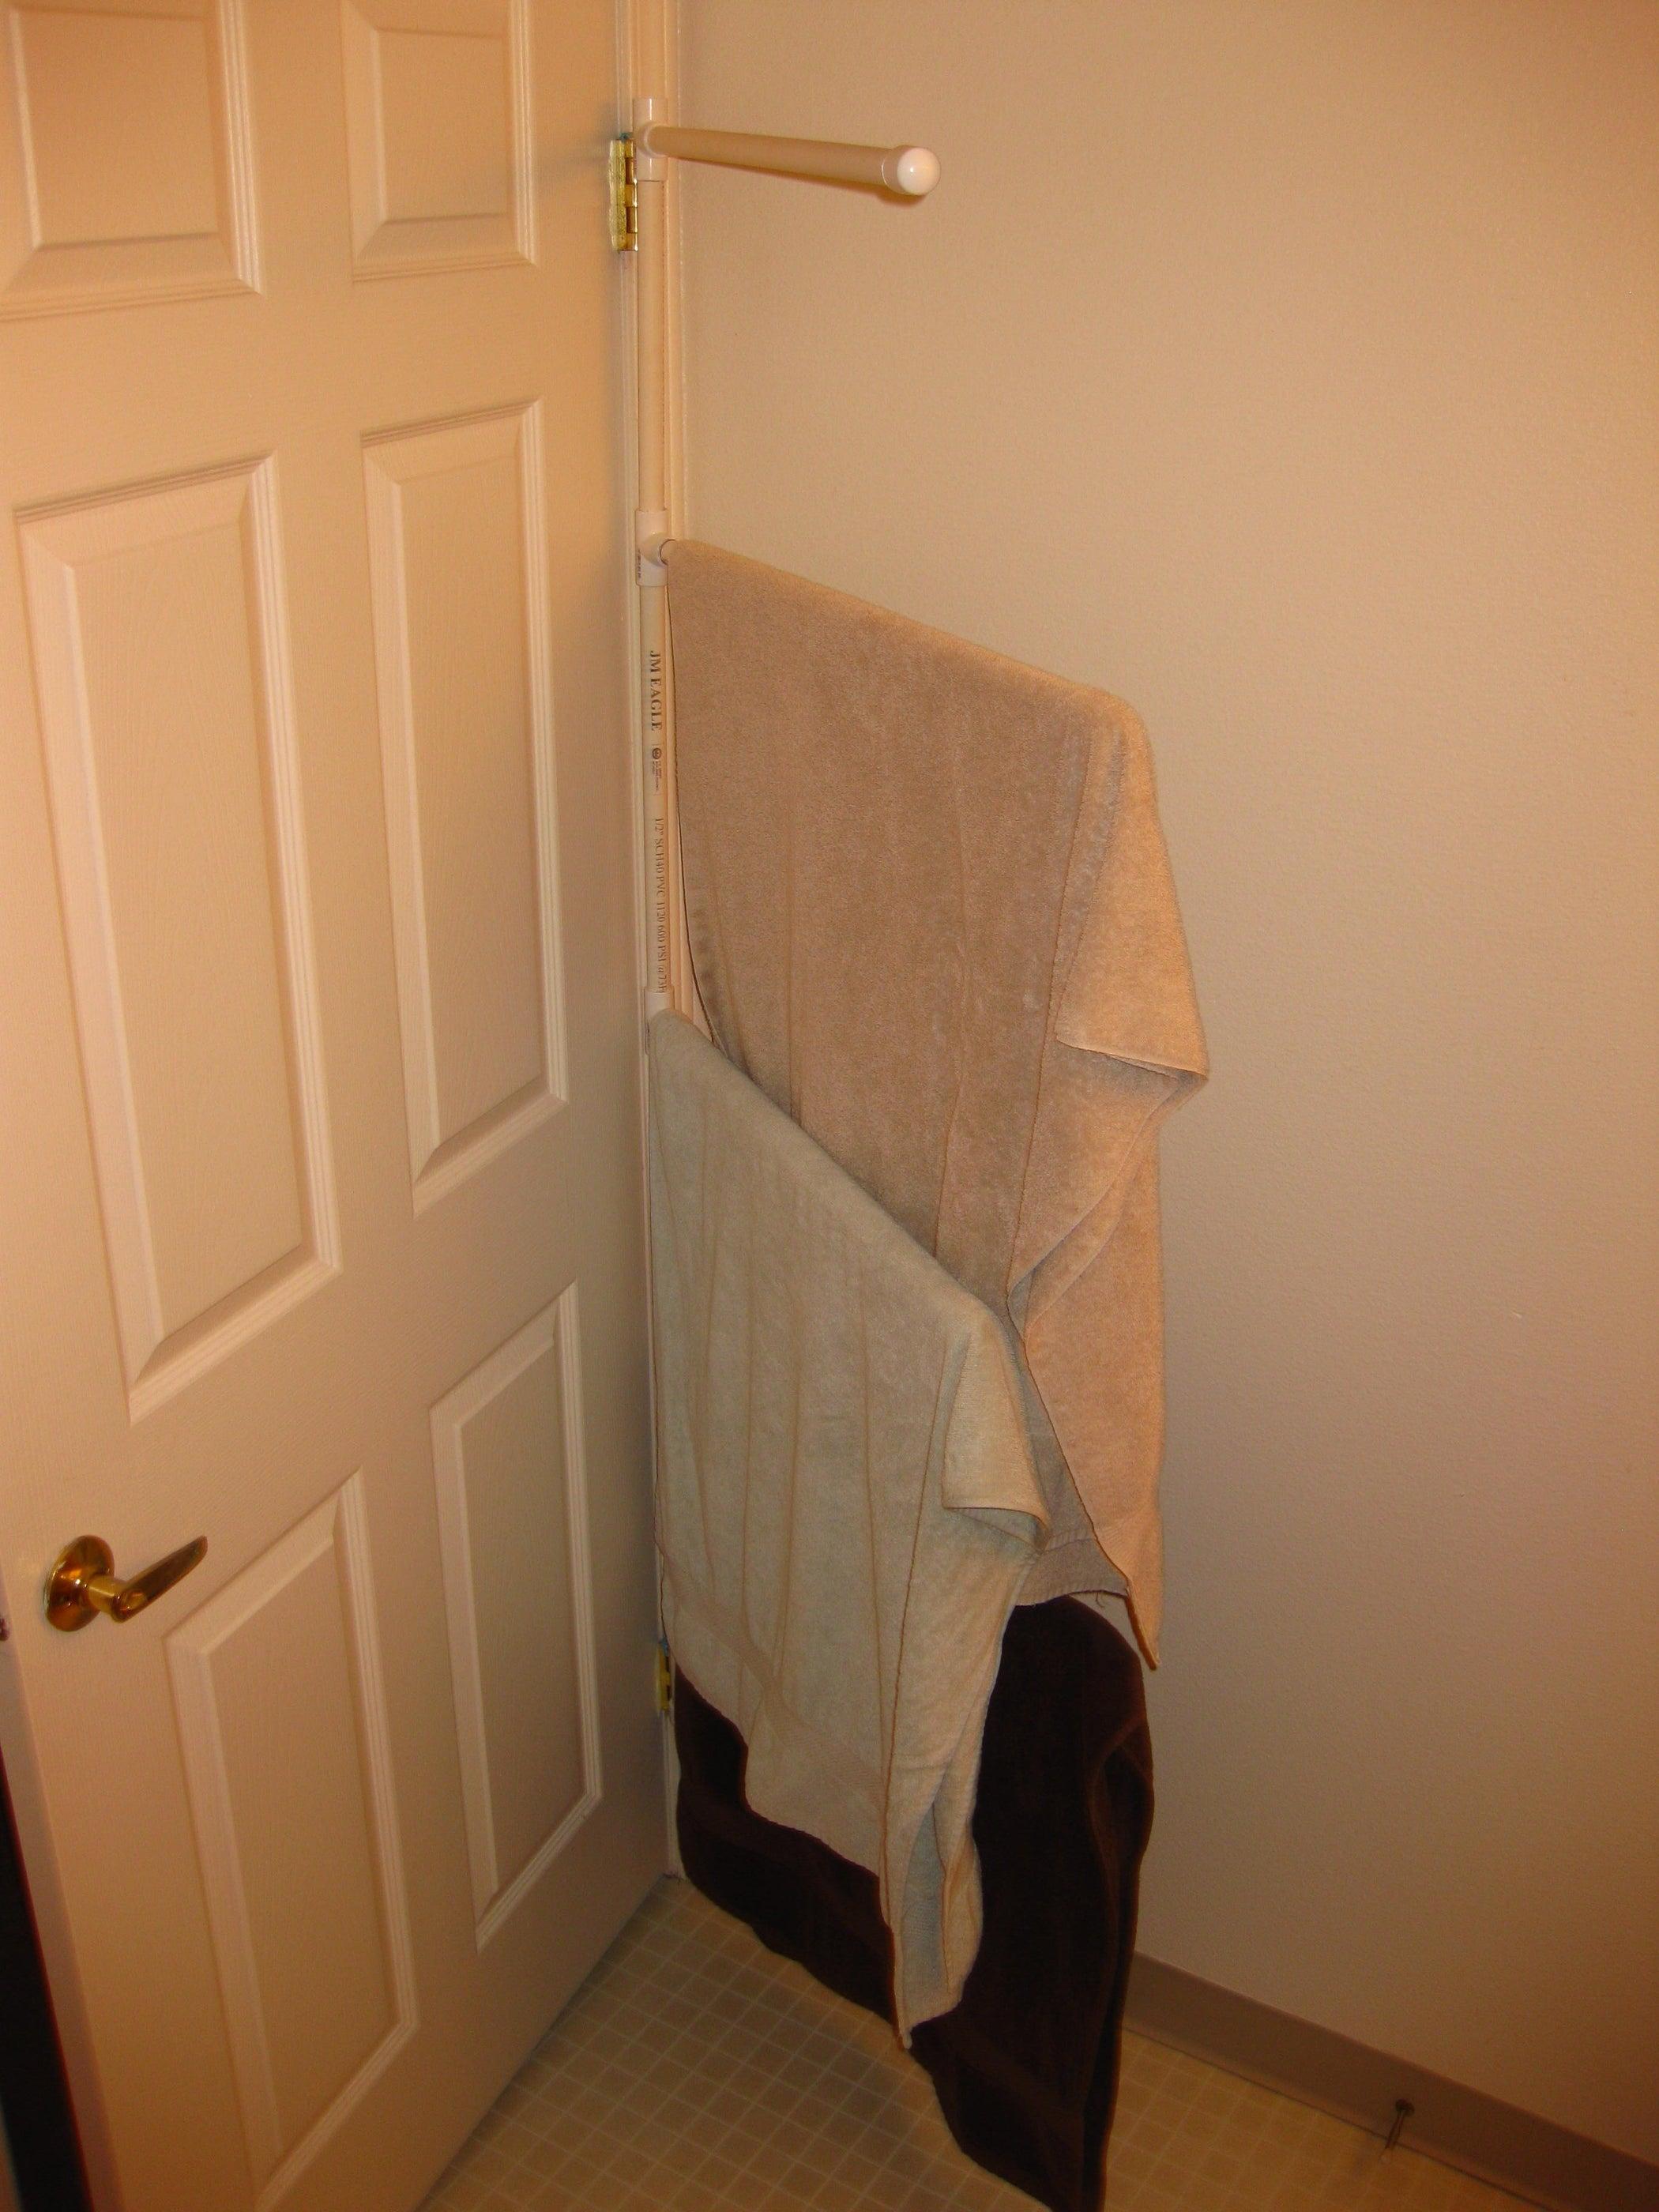 How To Make A Pvc Towel Rack